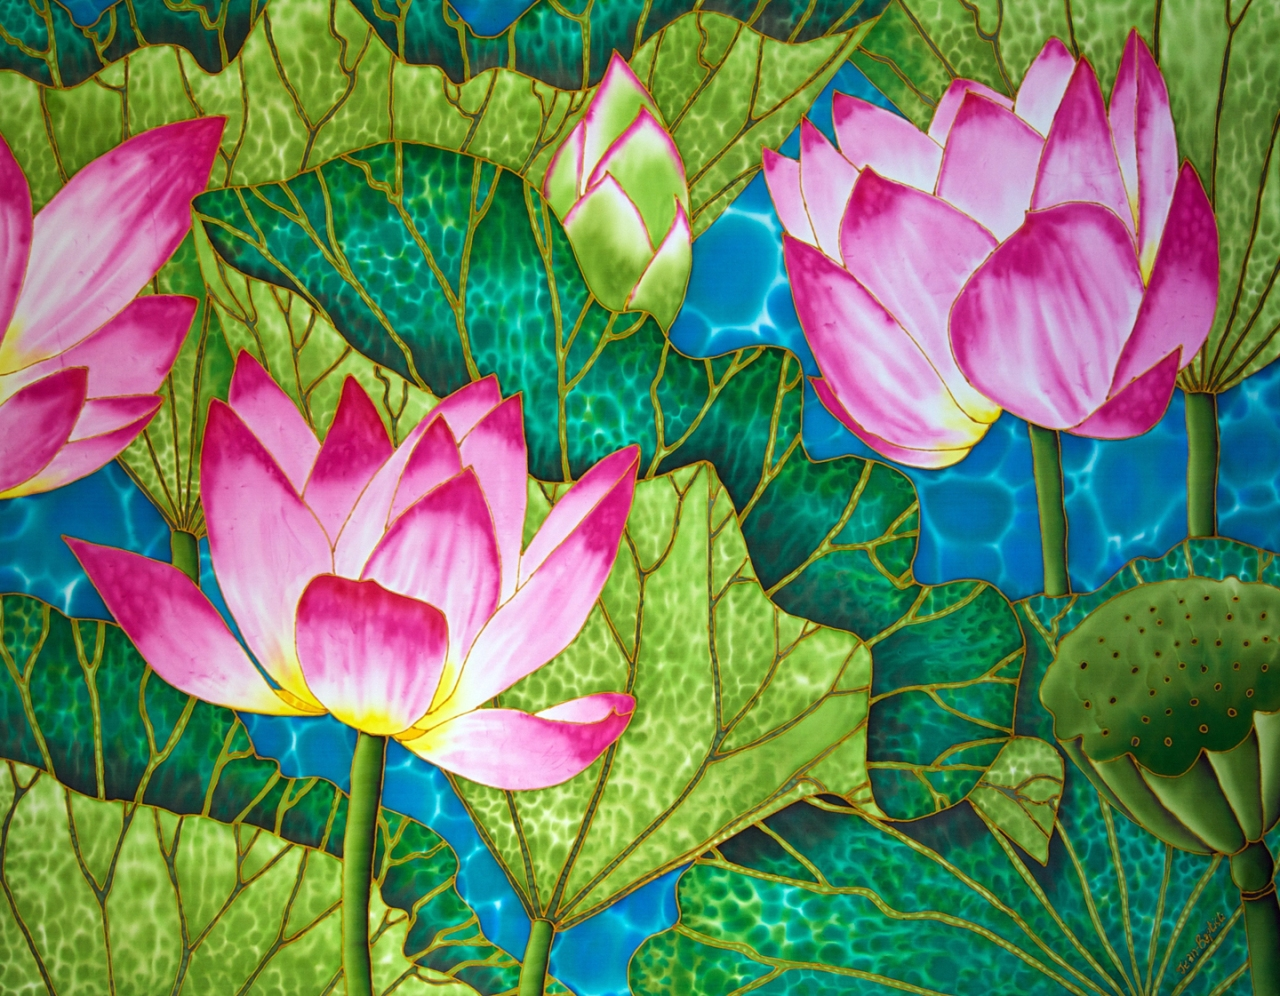 Jean baptiste latest art lotus pond tropical silk jean baptiste latest art lotus pond izmirmasajfo